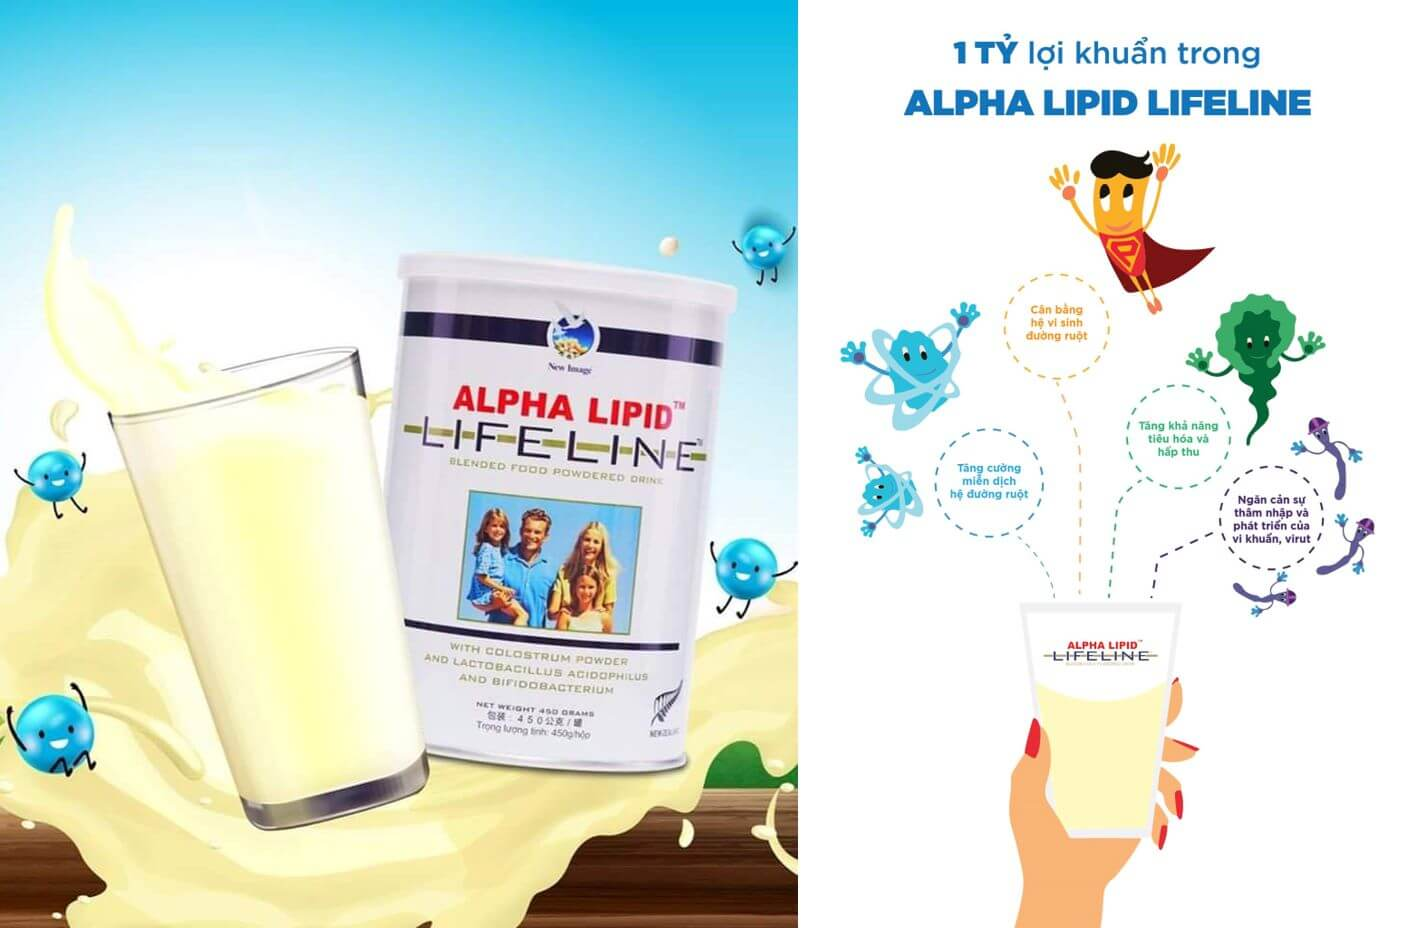 Sữa non Alpha Lipid Lifeline chính hãng nhập khẩu